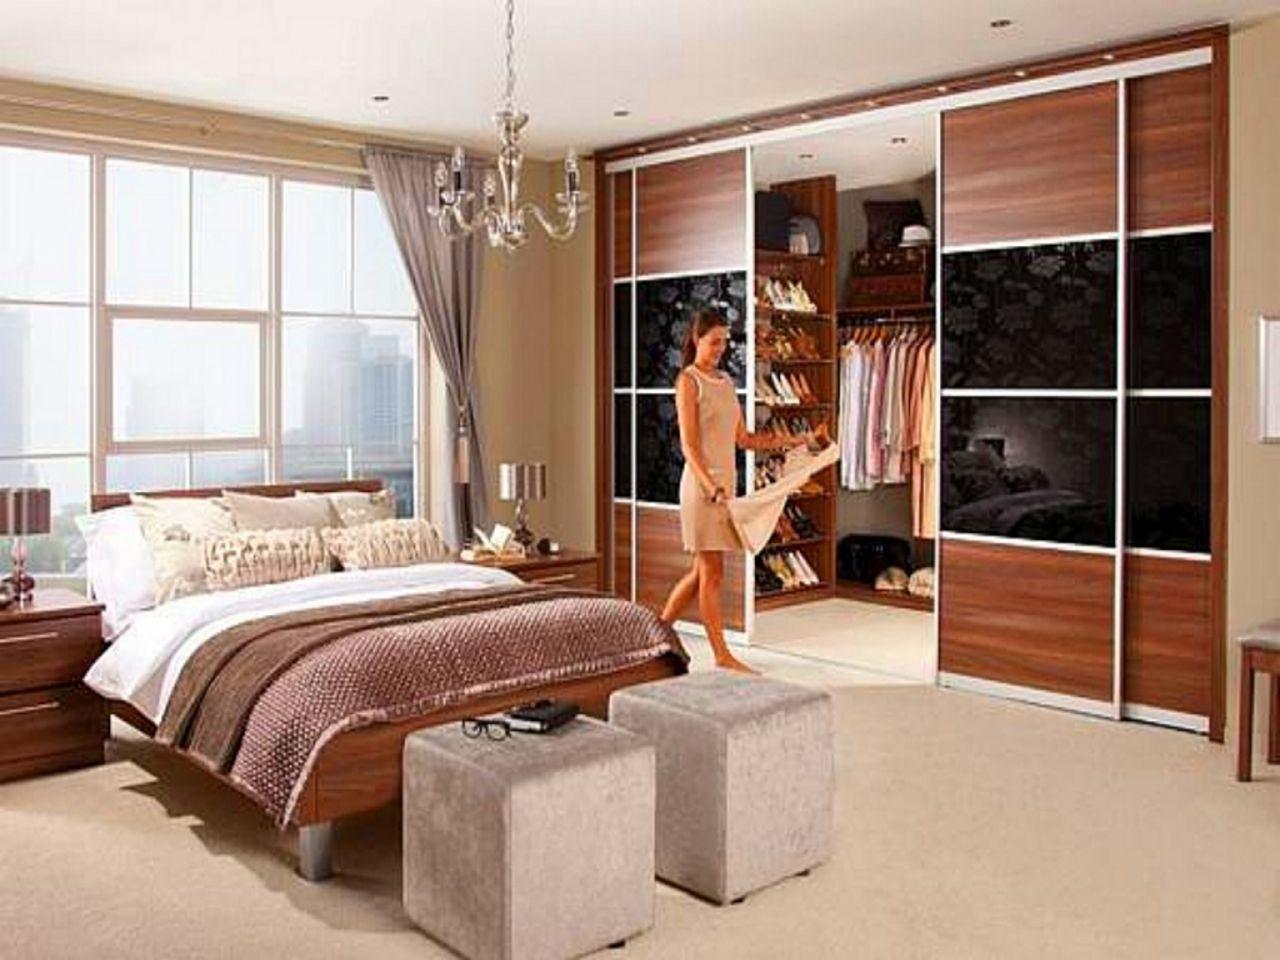 25 Top And Attractive Master Bedroom Walk In Closet Design Ideas